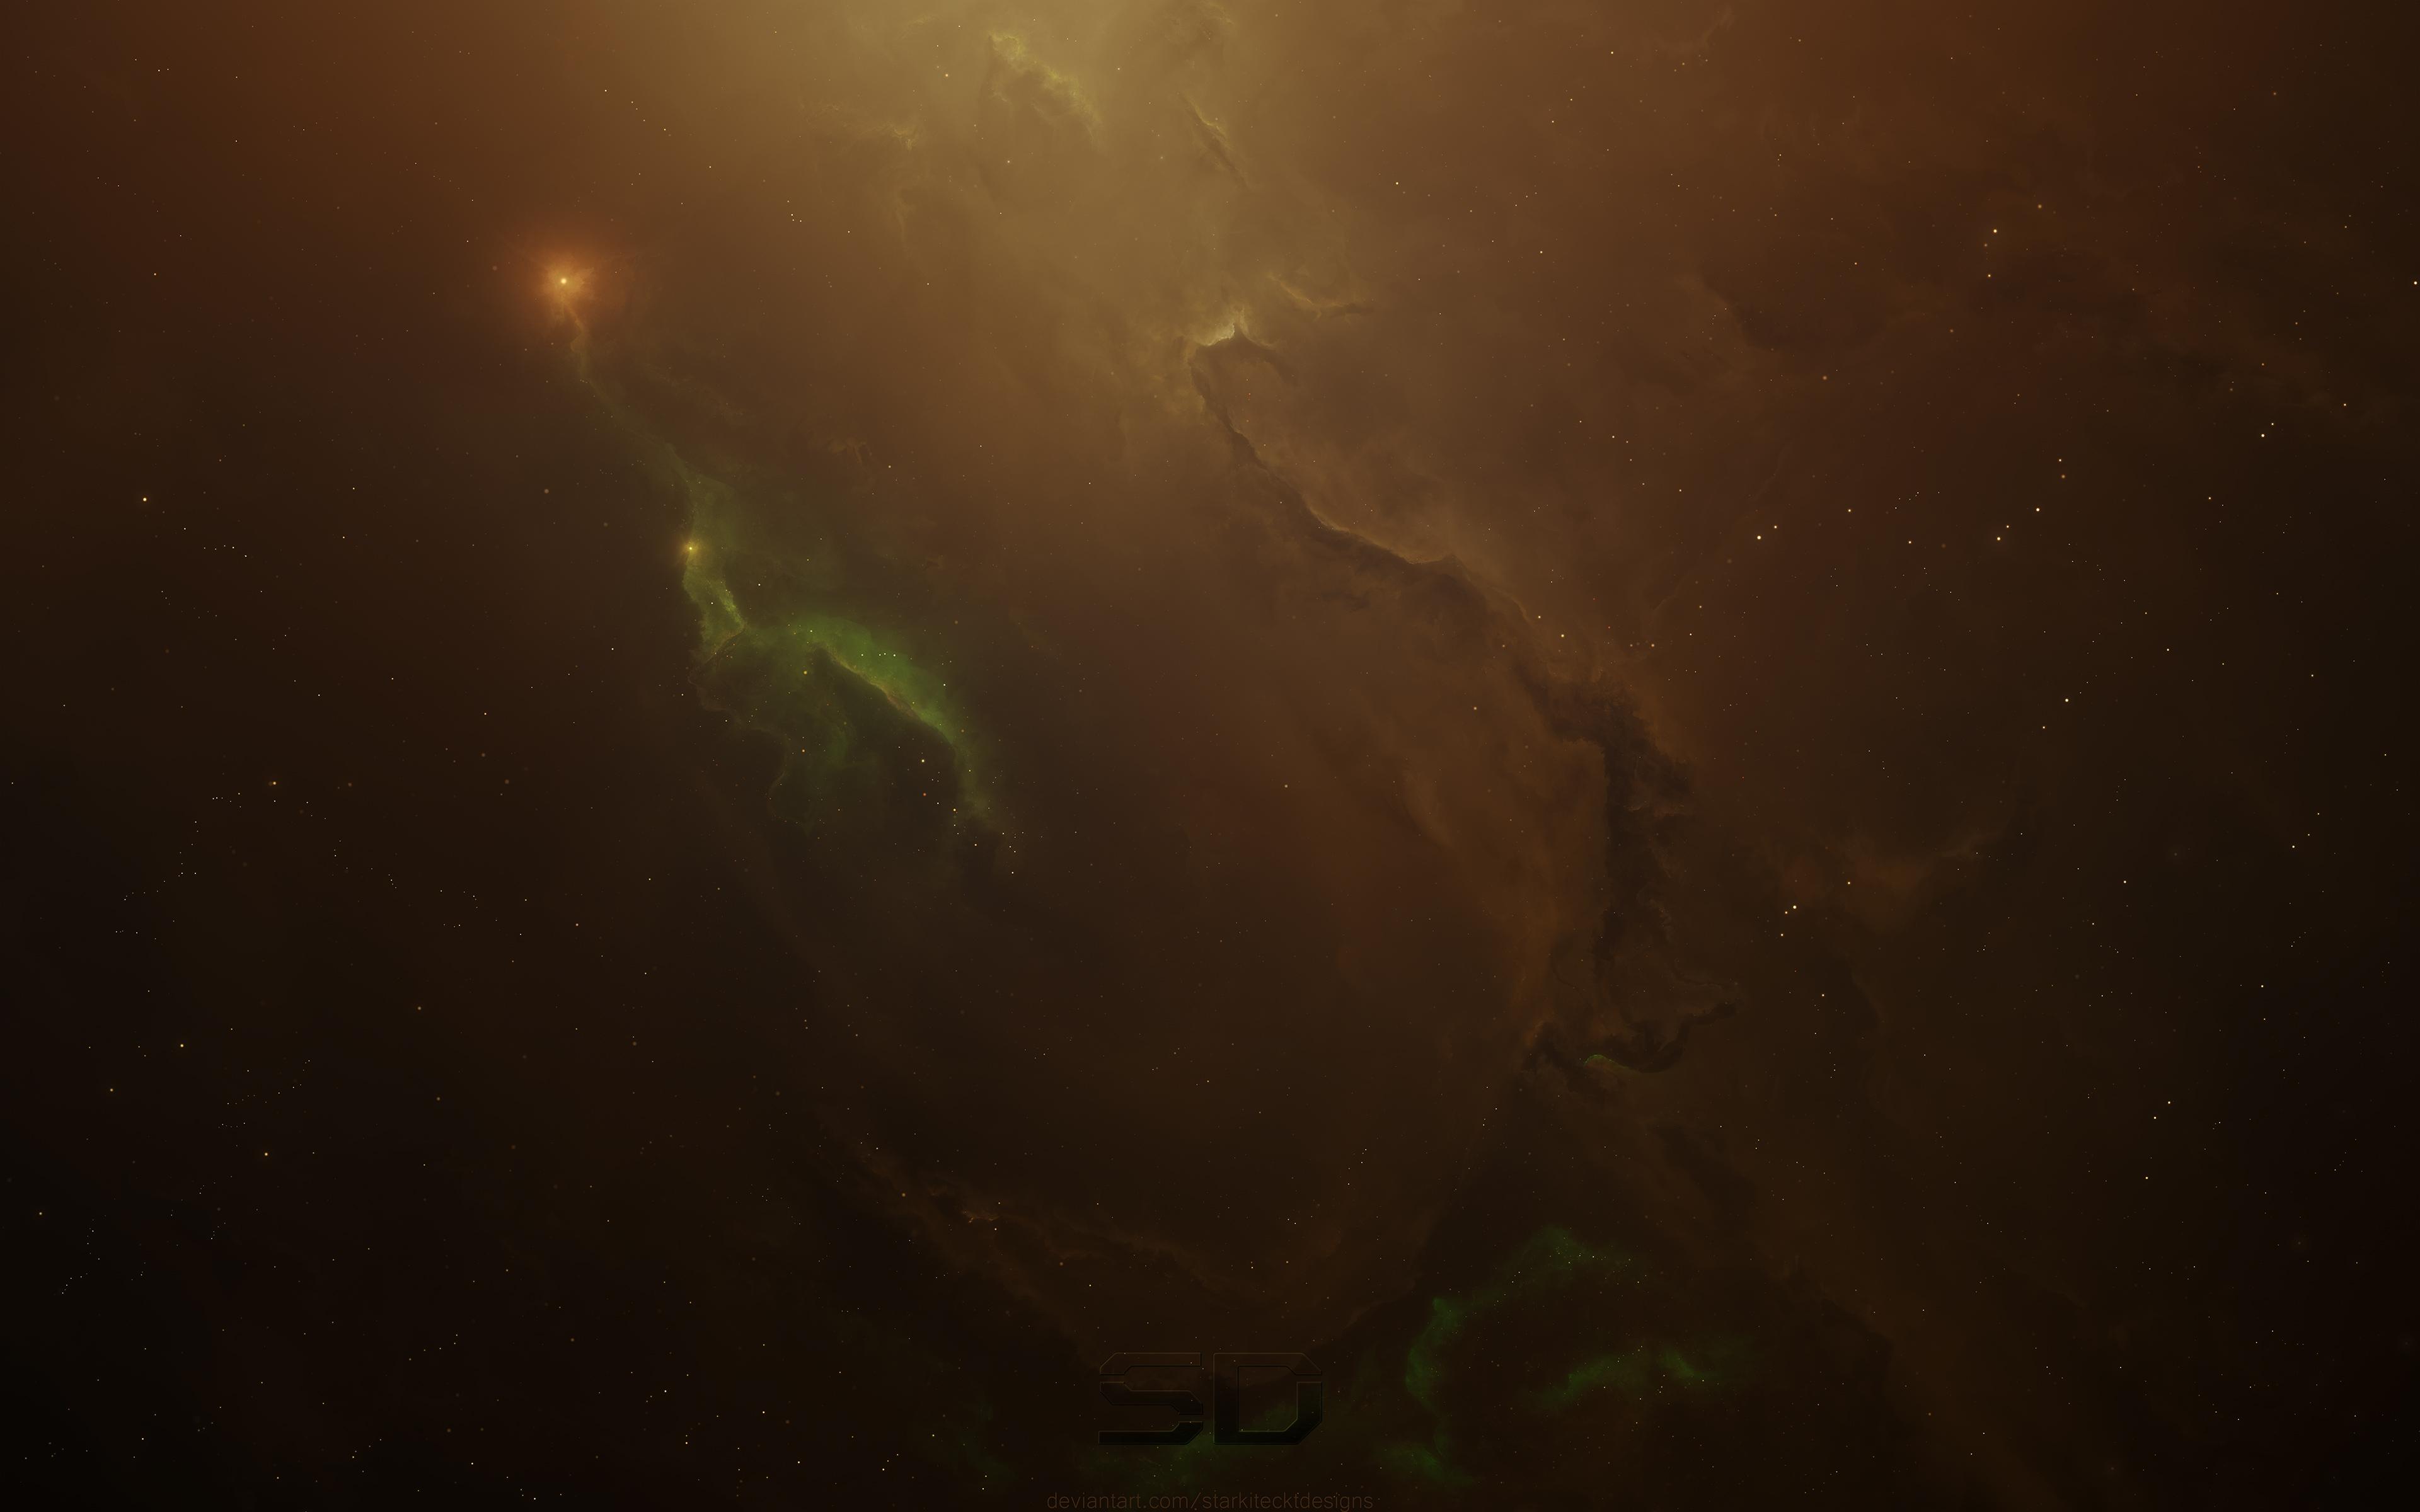 nebula space brown immersive 1574942809 - Nebula Space Brown Immersive -